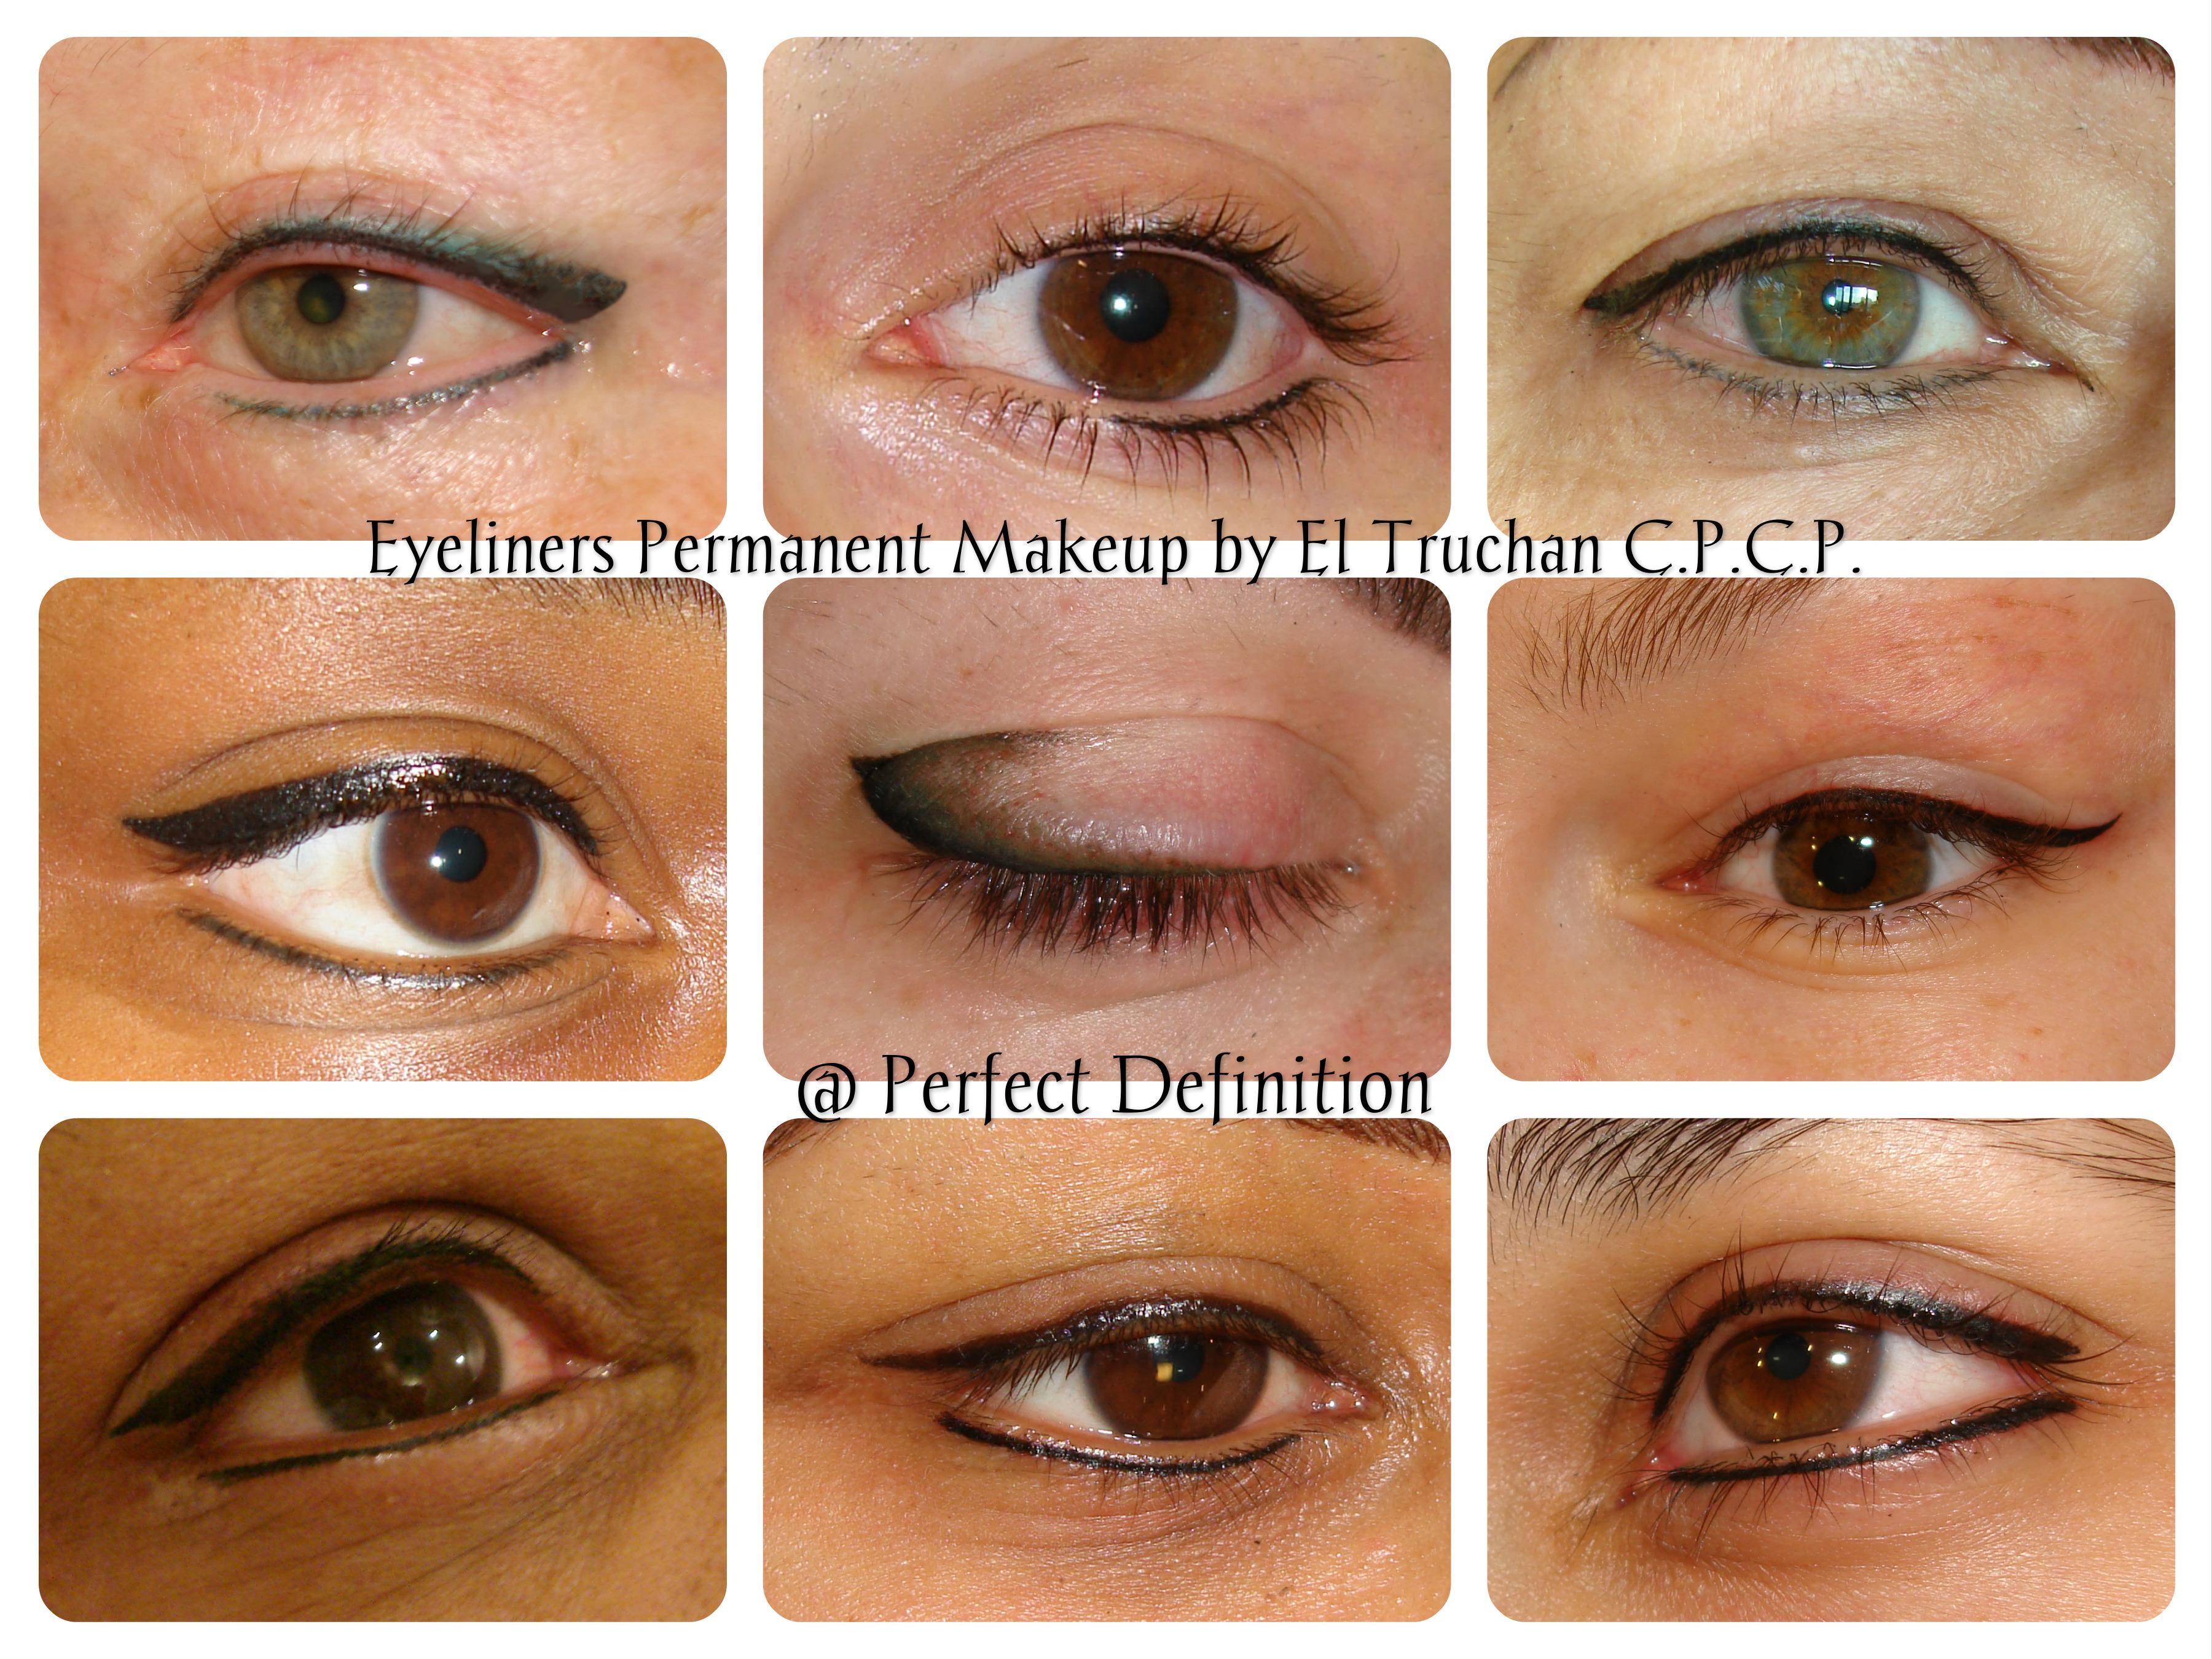 Eyeliners Permanent Makeup